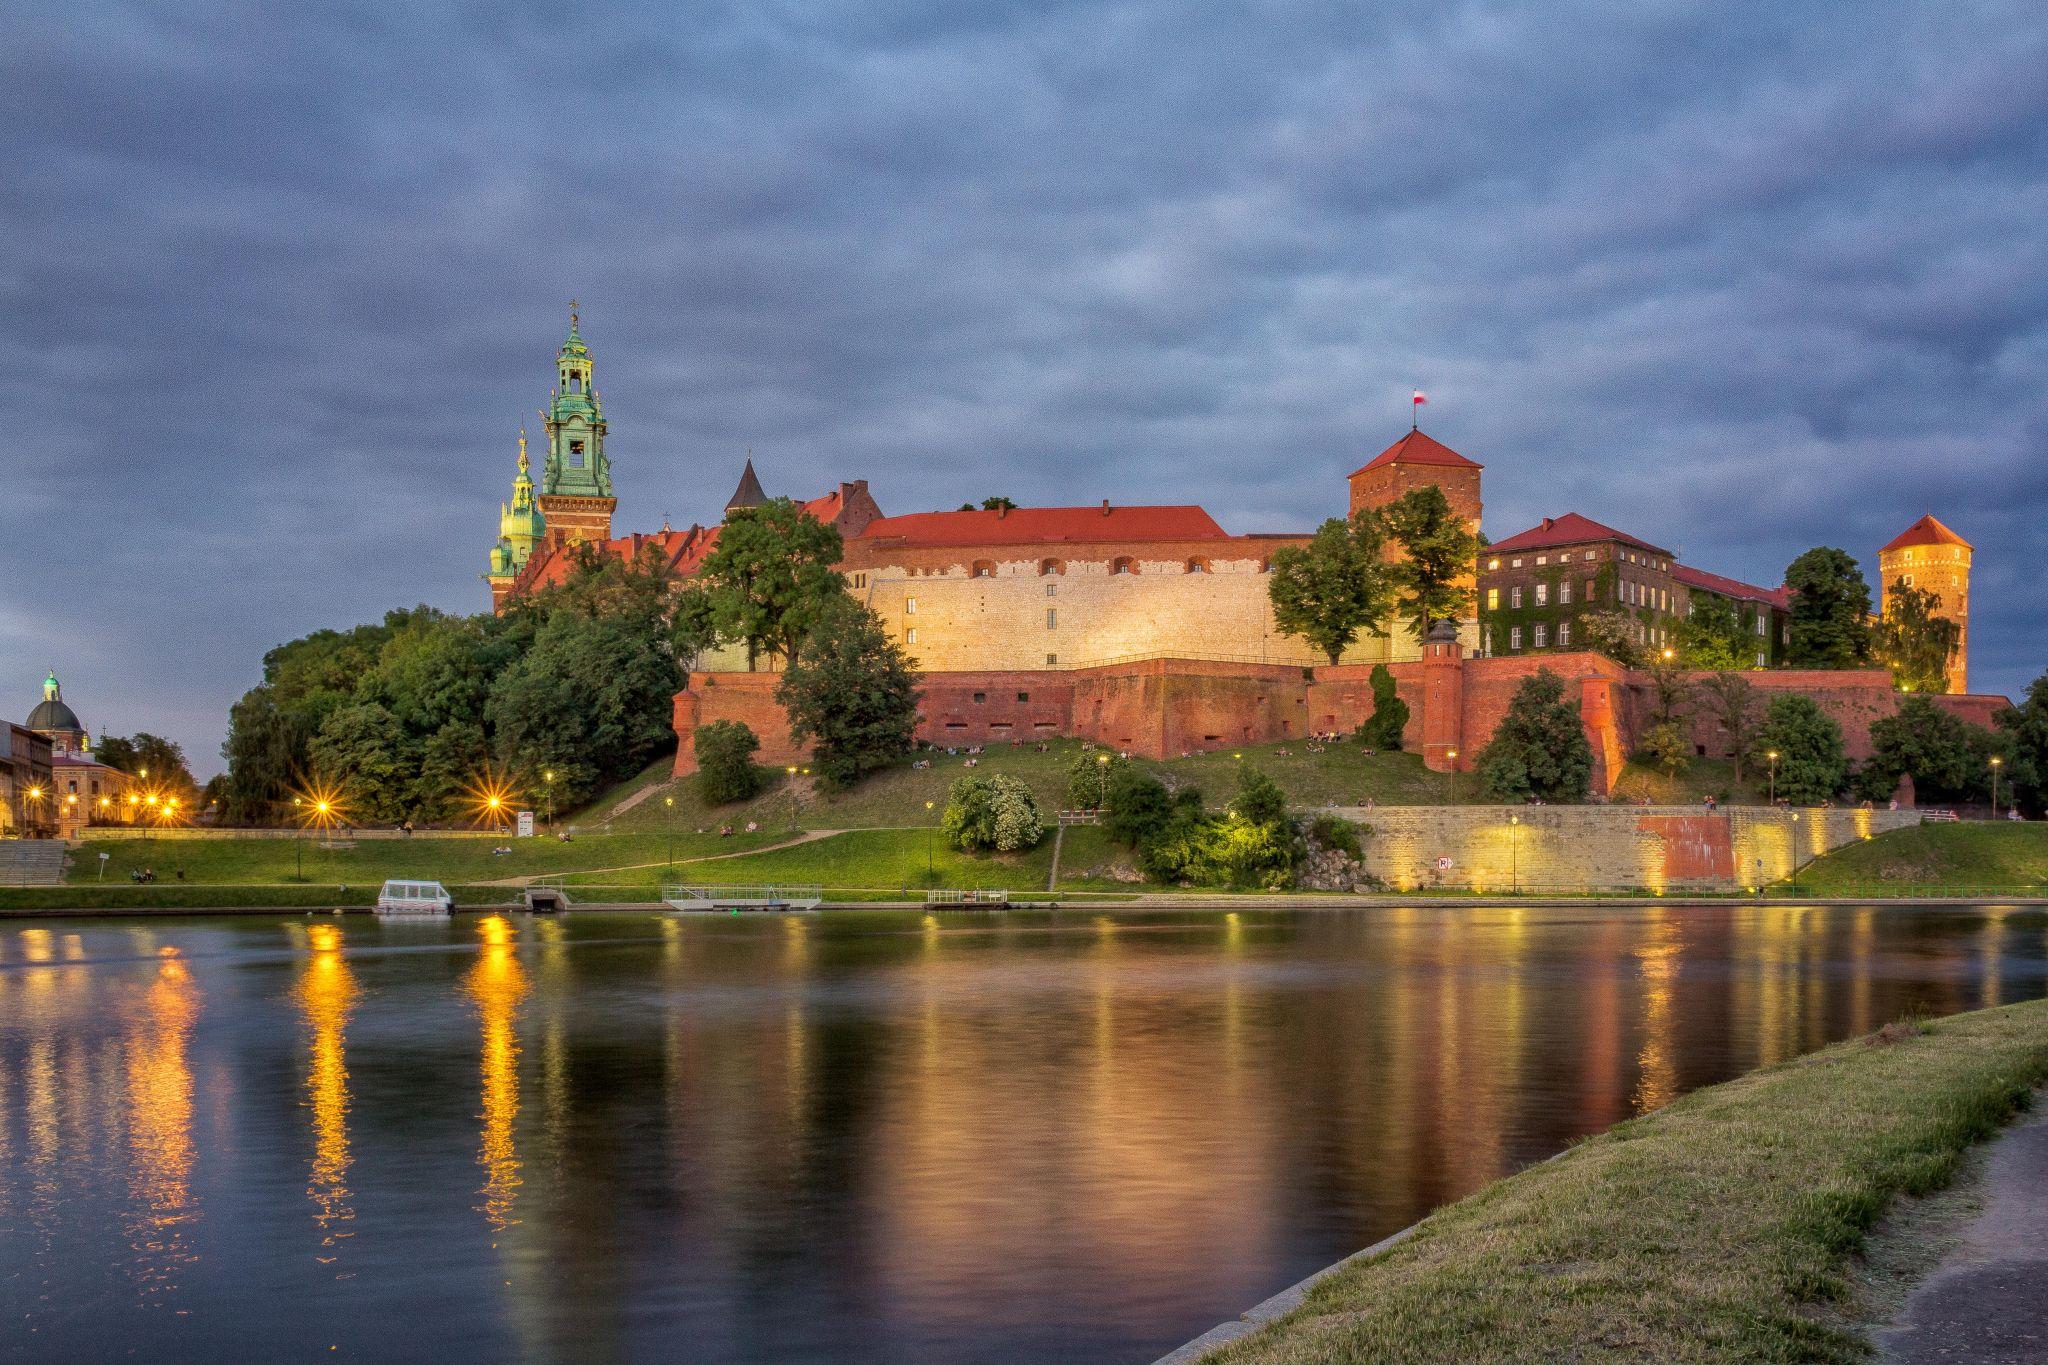 Wawel at sunset, Poland